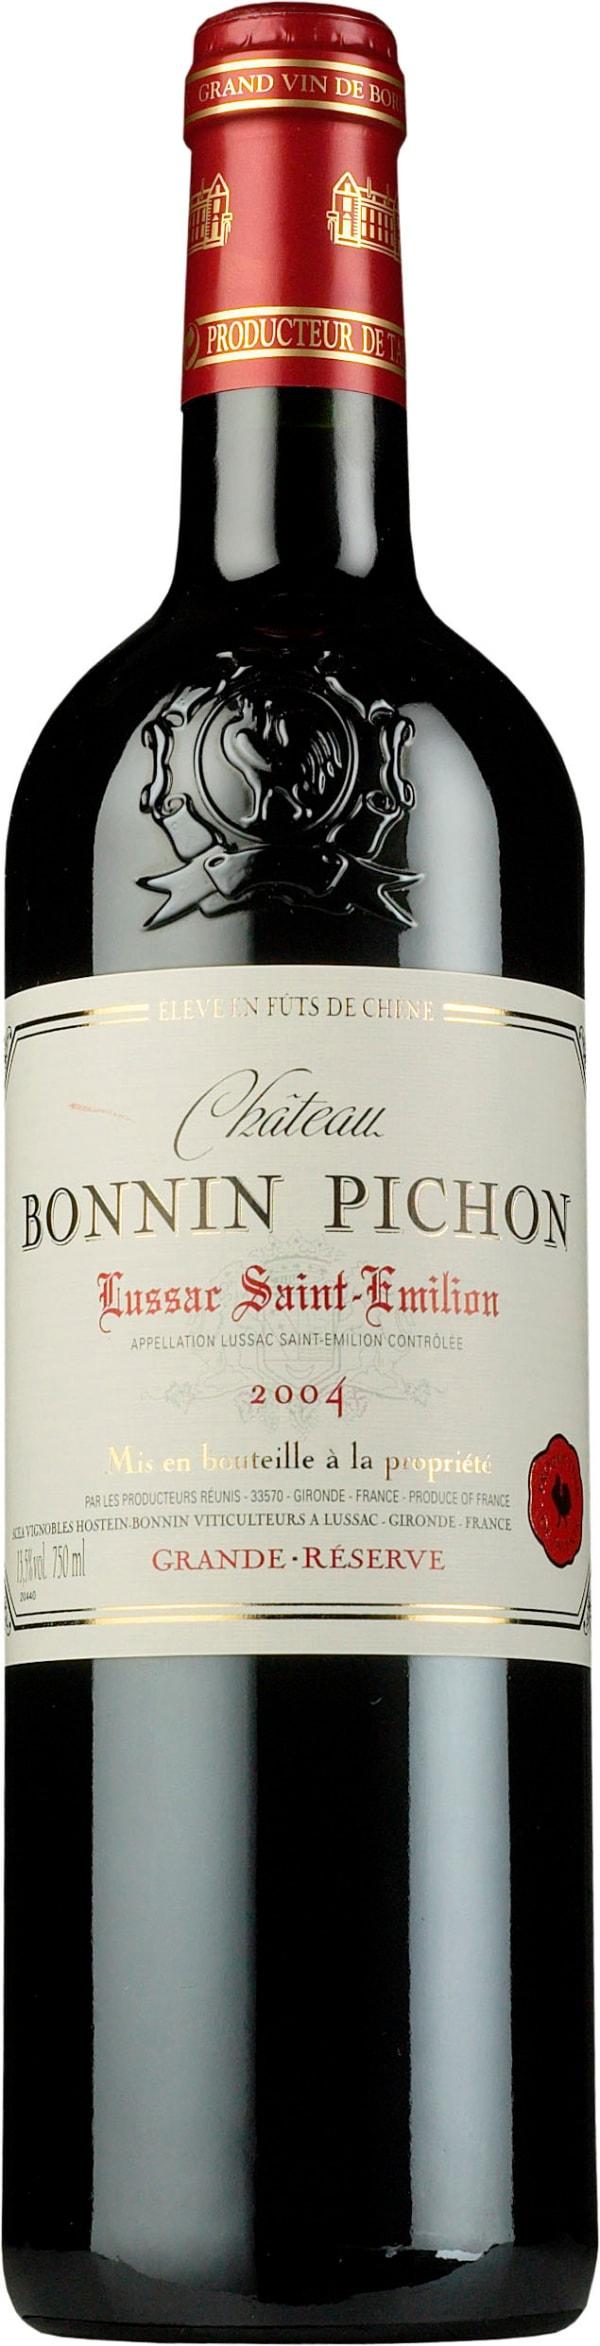 Château Bonnin Pichon 2019